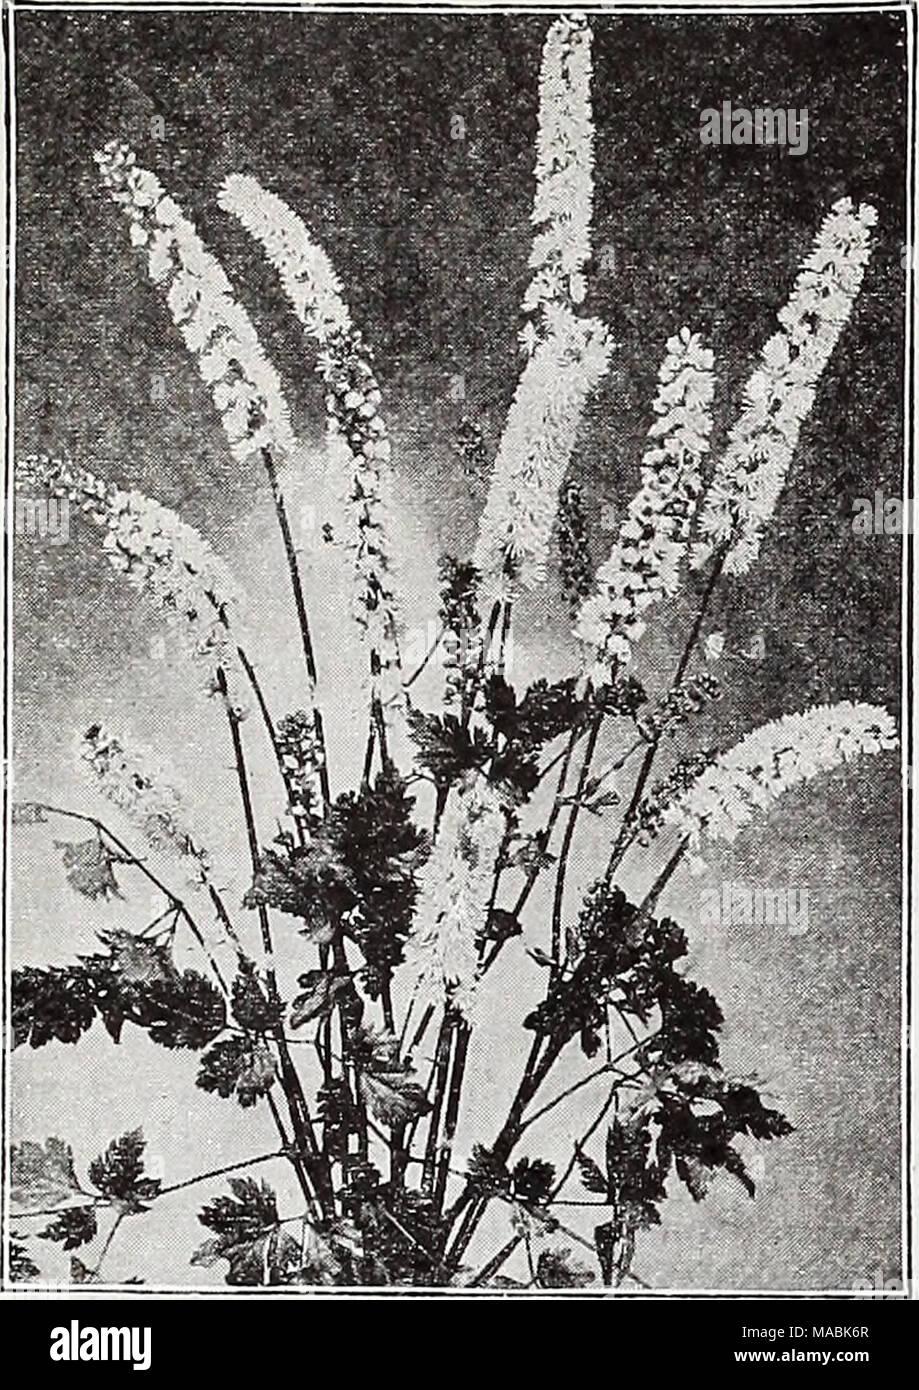 Dreers Wholesale Price List For Florists Bulbs Flower Seeds Lawn